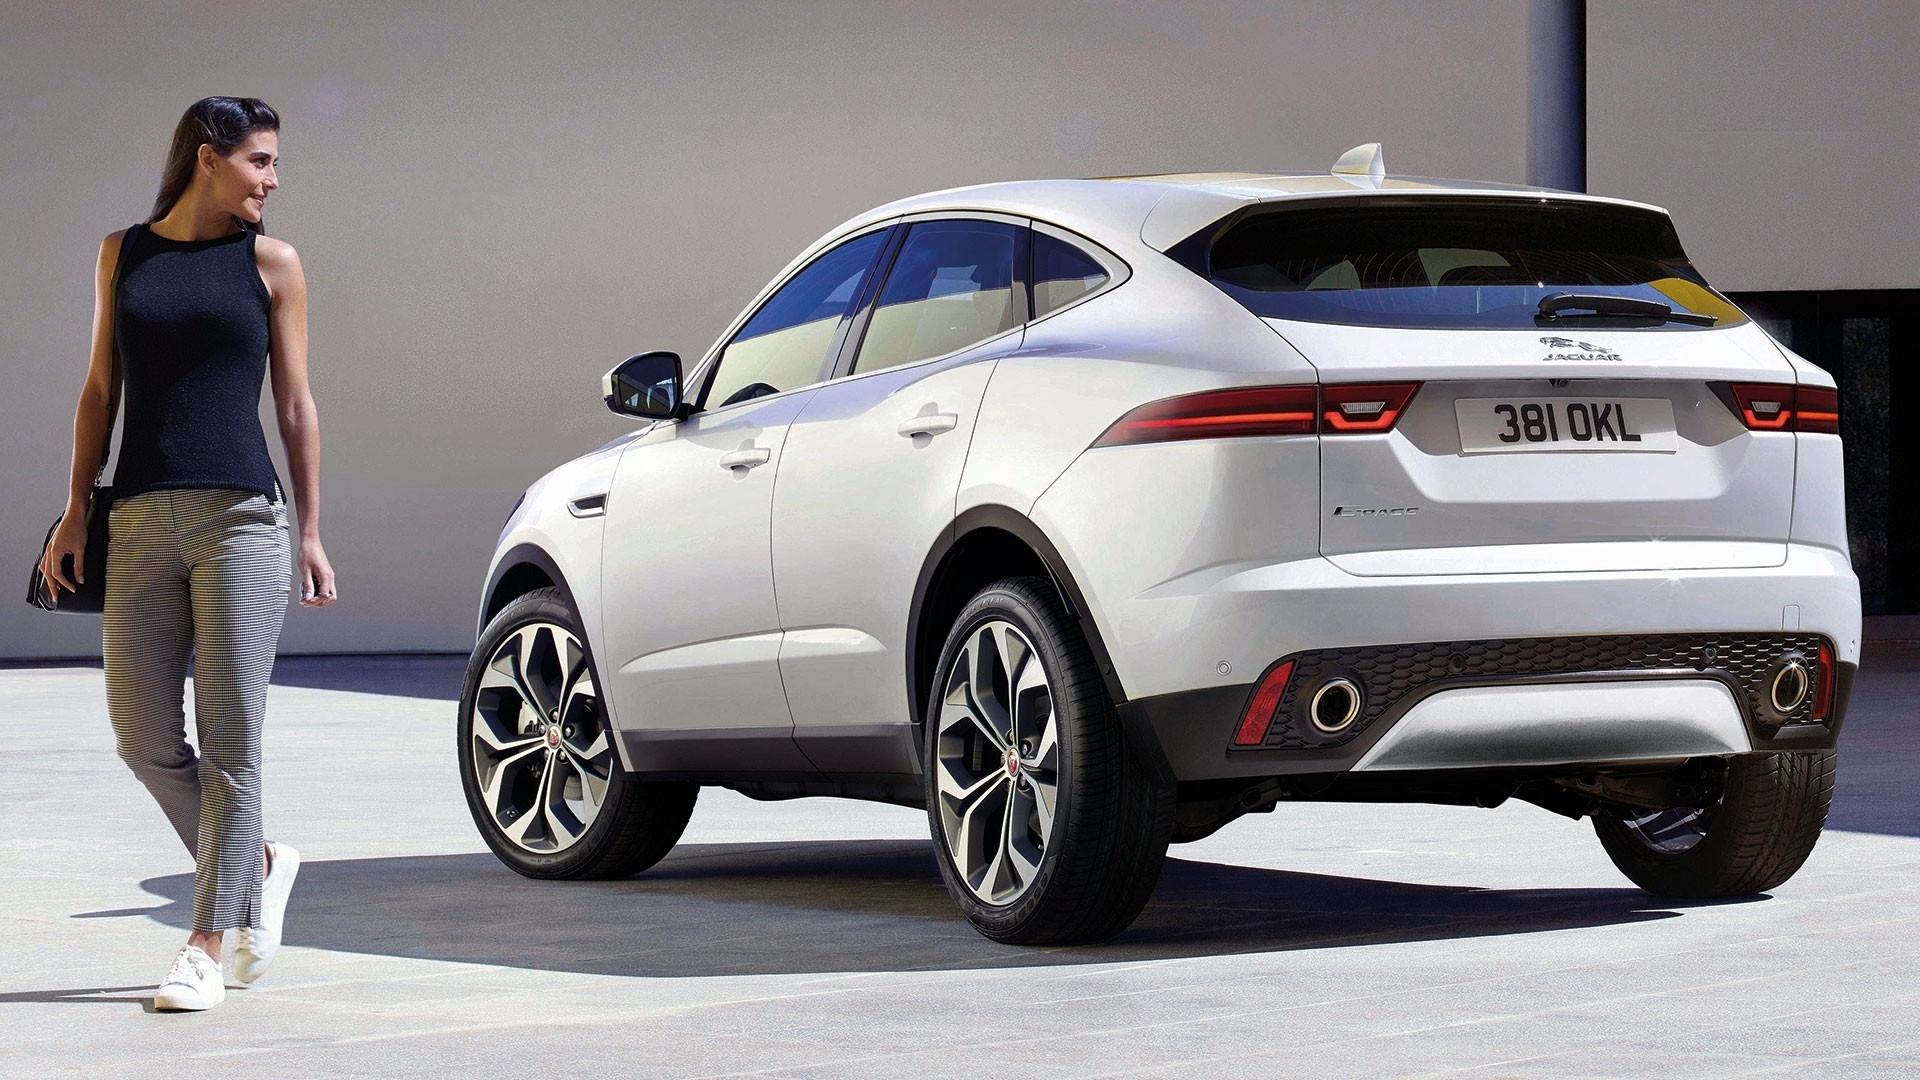 dbd149cfd49f Quanto costa la Jaguar E-Pace